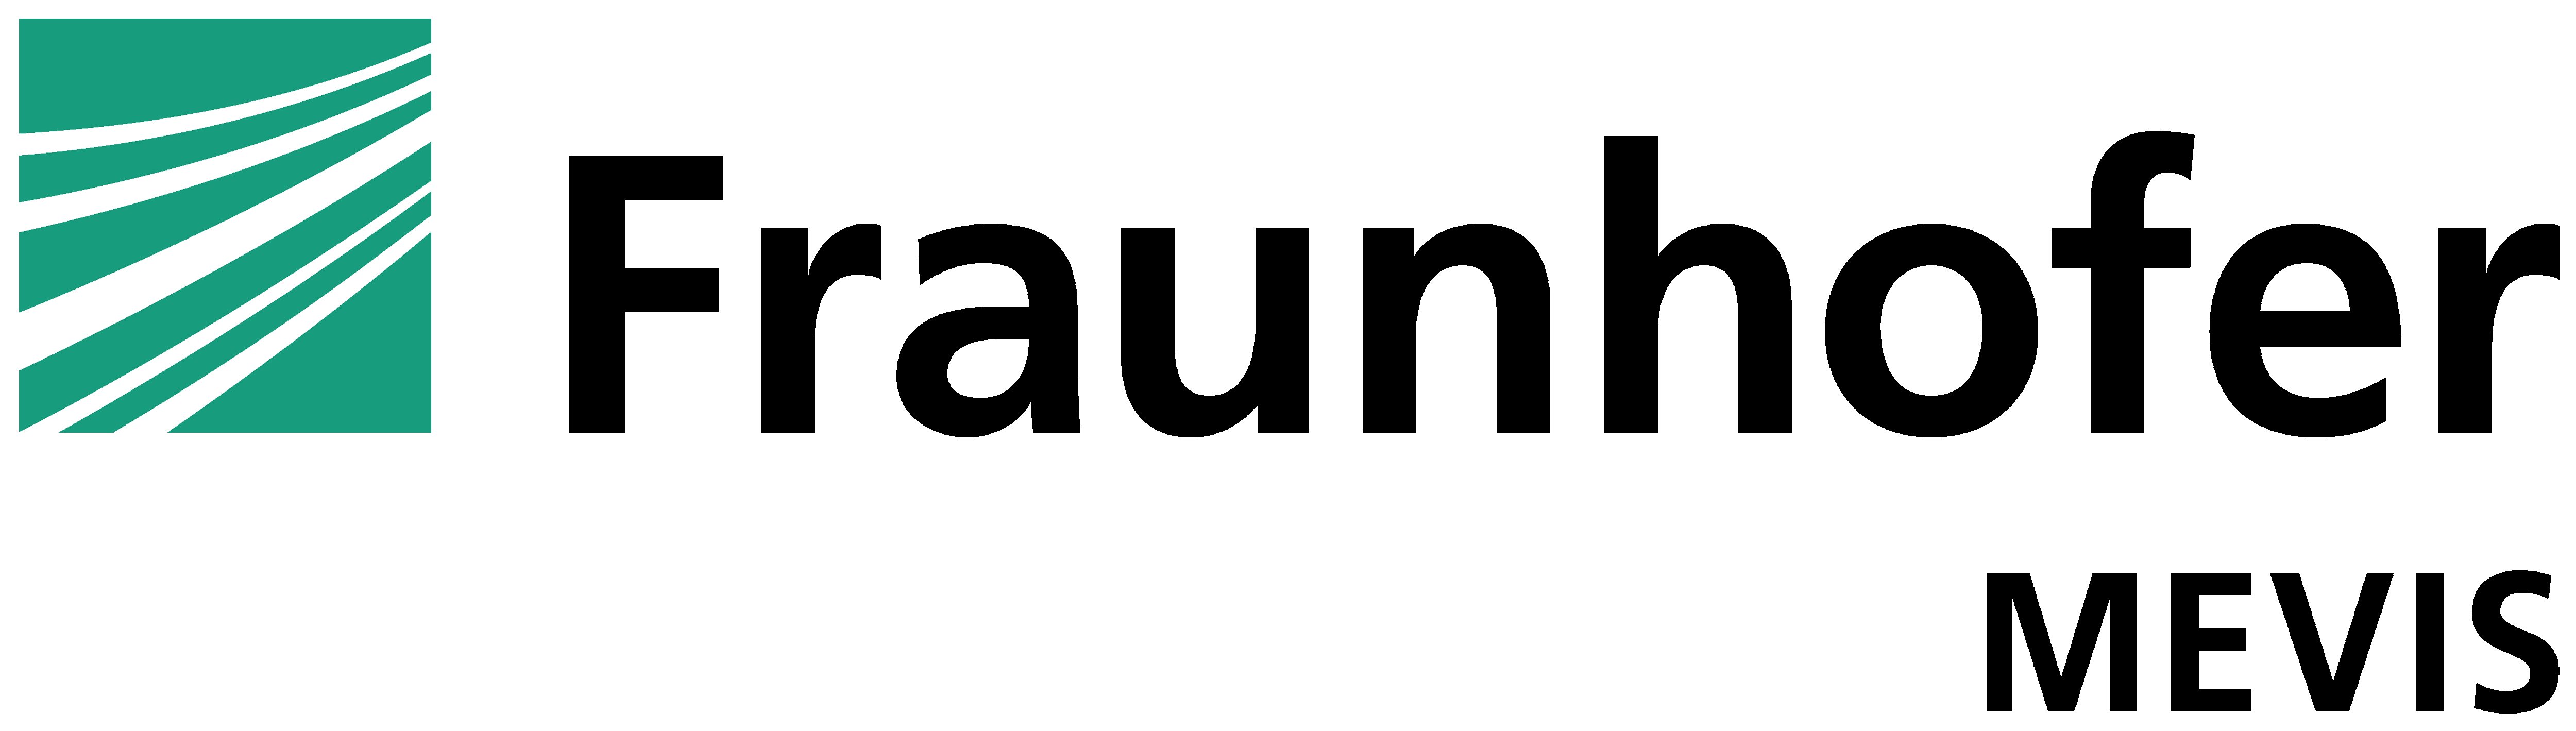 Fraunhofer MEVIS